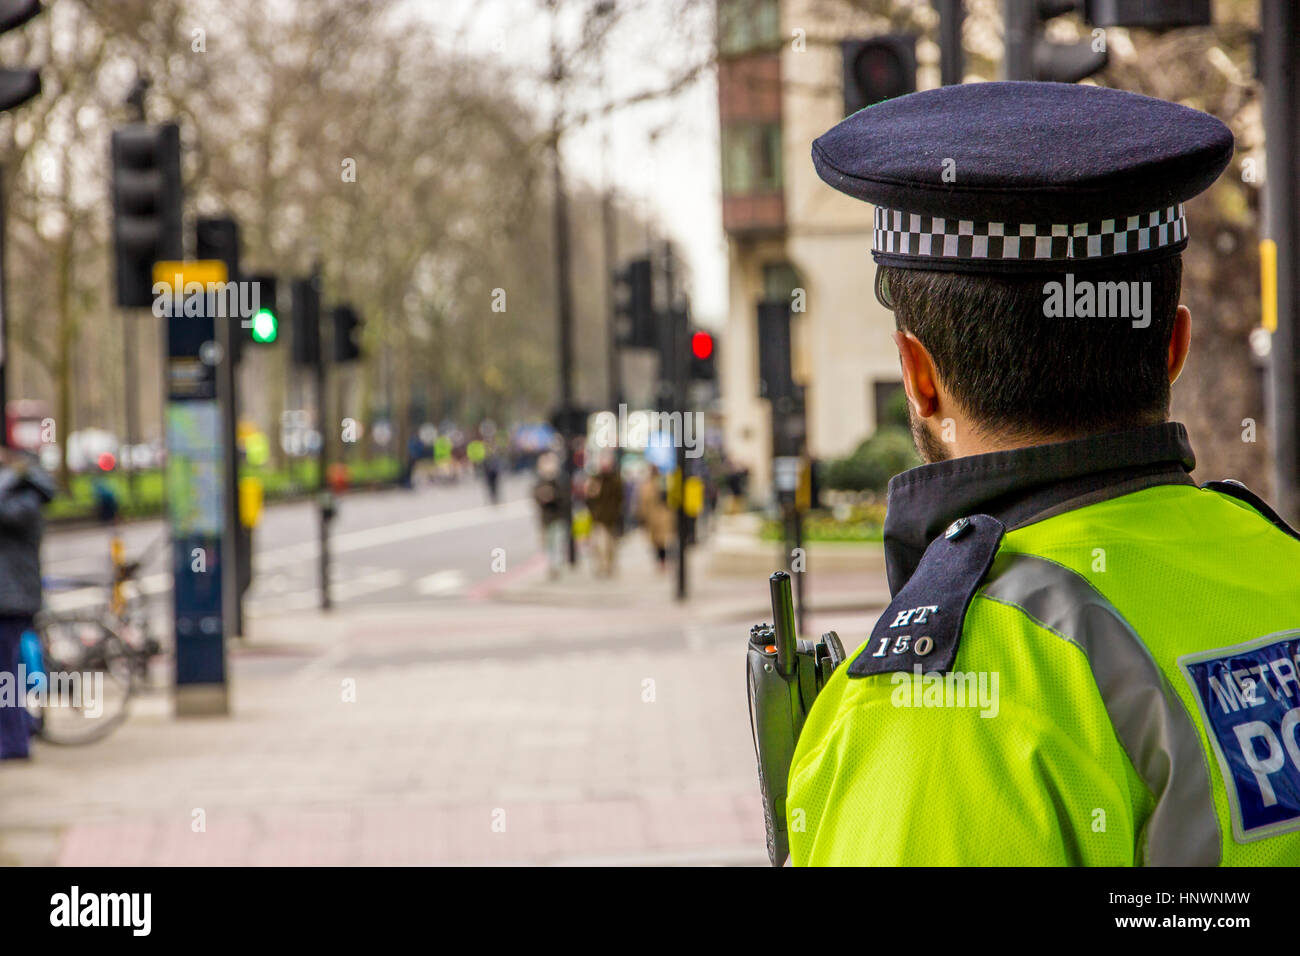 Metropolitan Police Officer - Stock Image